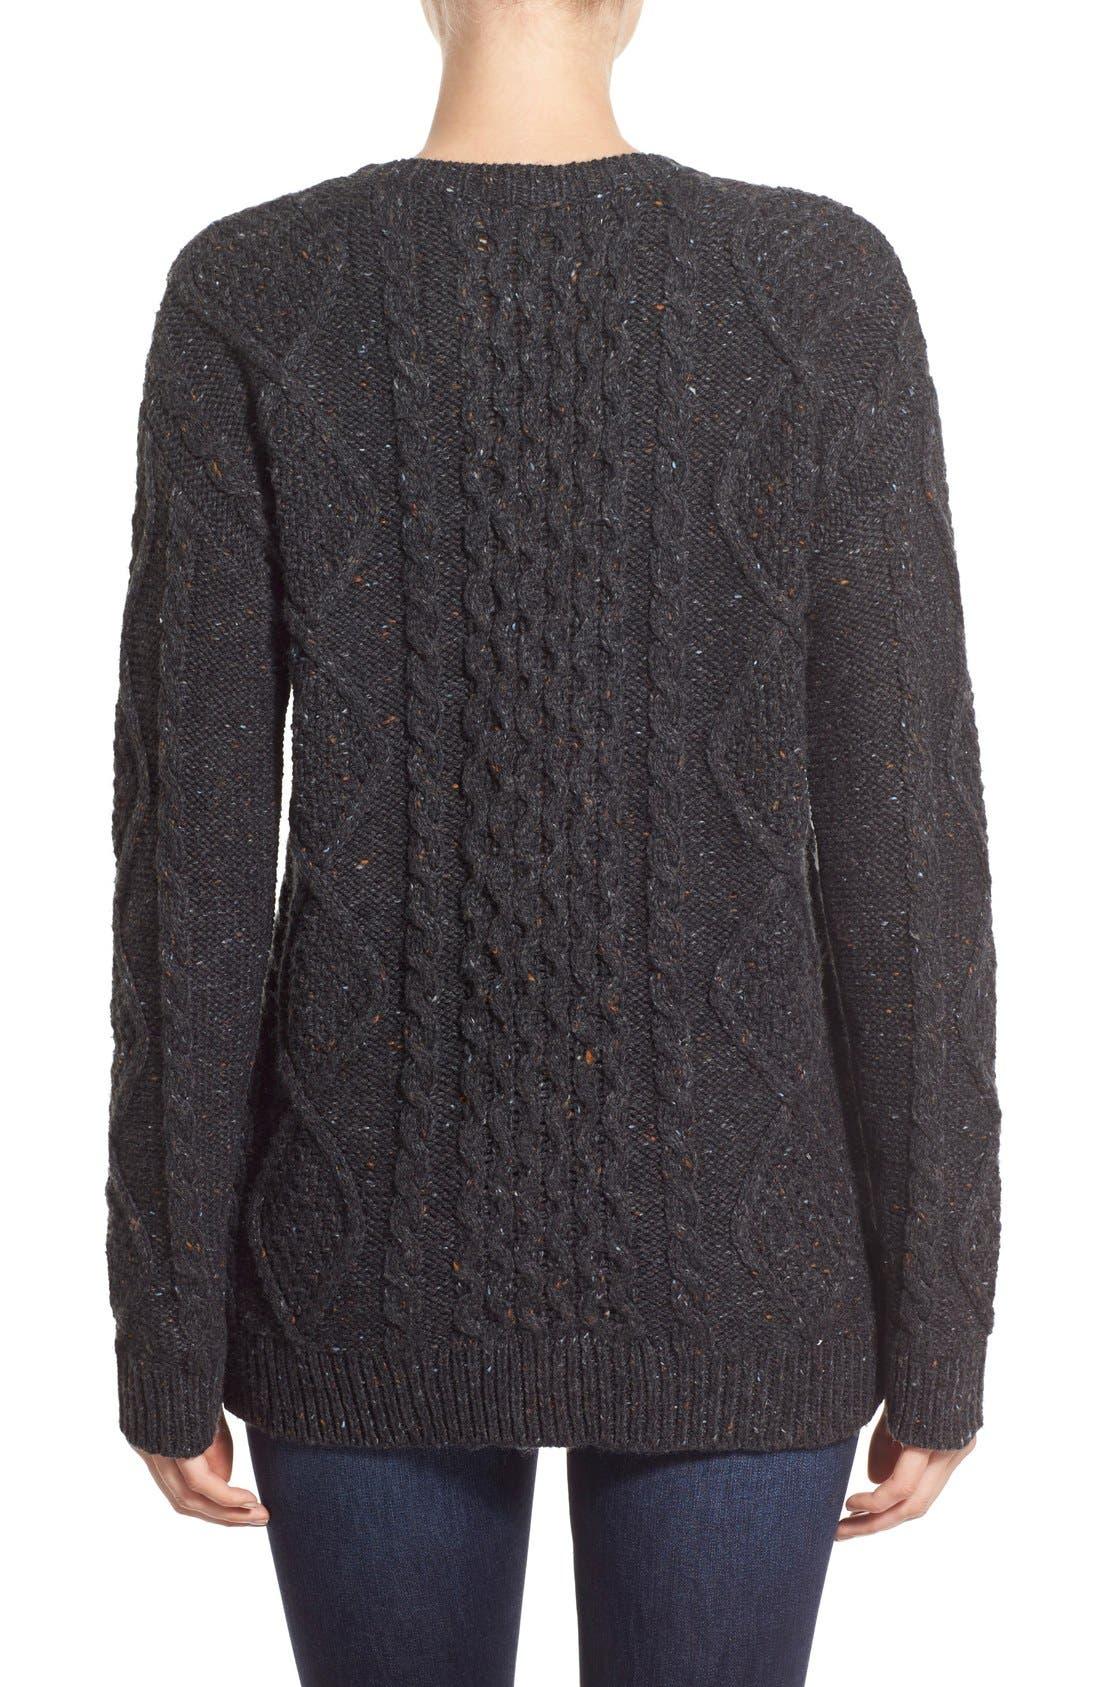 Treasure&Bond Cable Knit Sweater,                             Alternate thumbnail 3, color,                             020